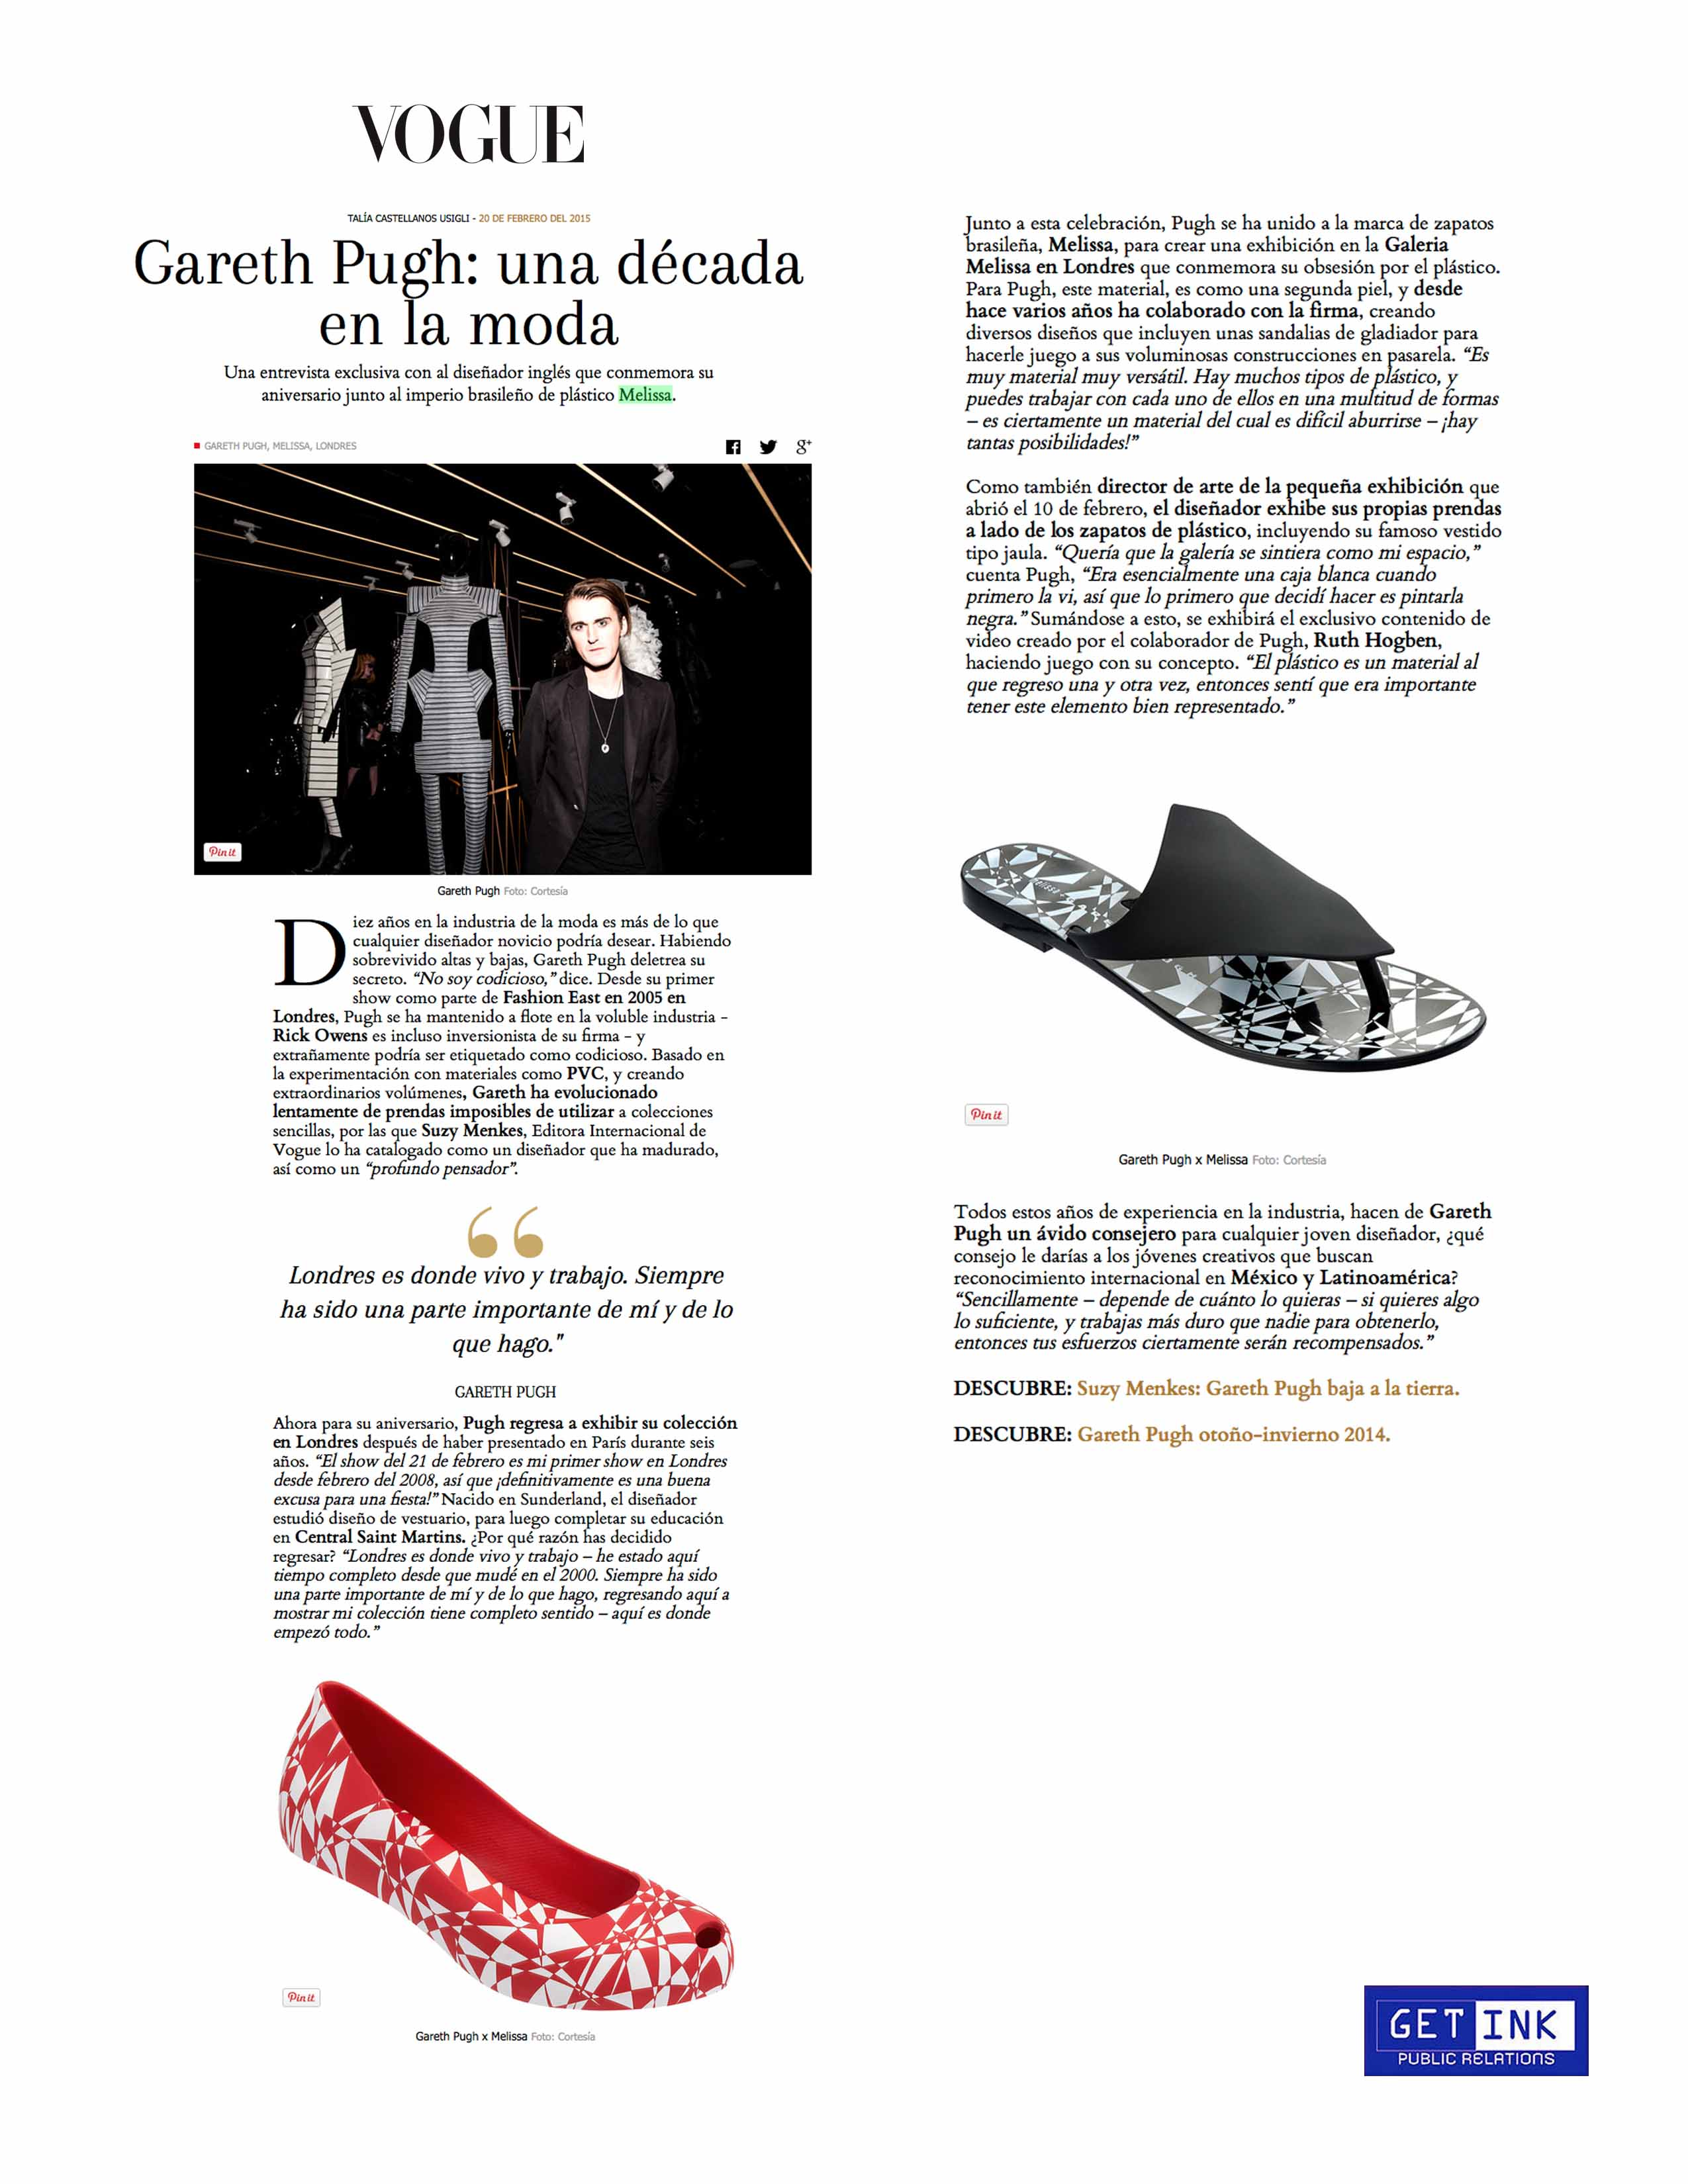 Melissa Shoes Vogue Mexico - Get Ink PR